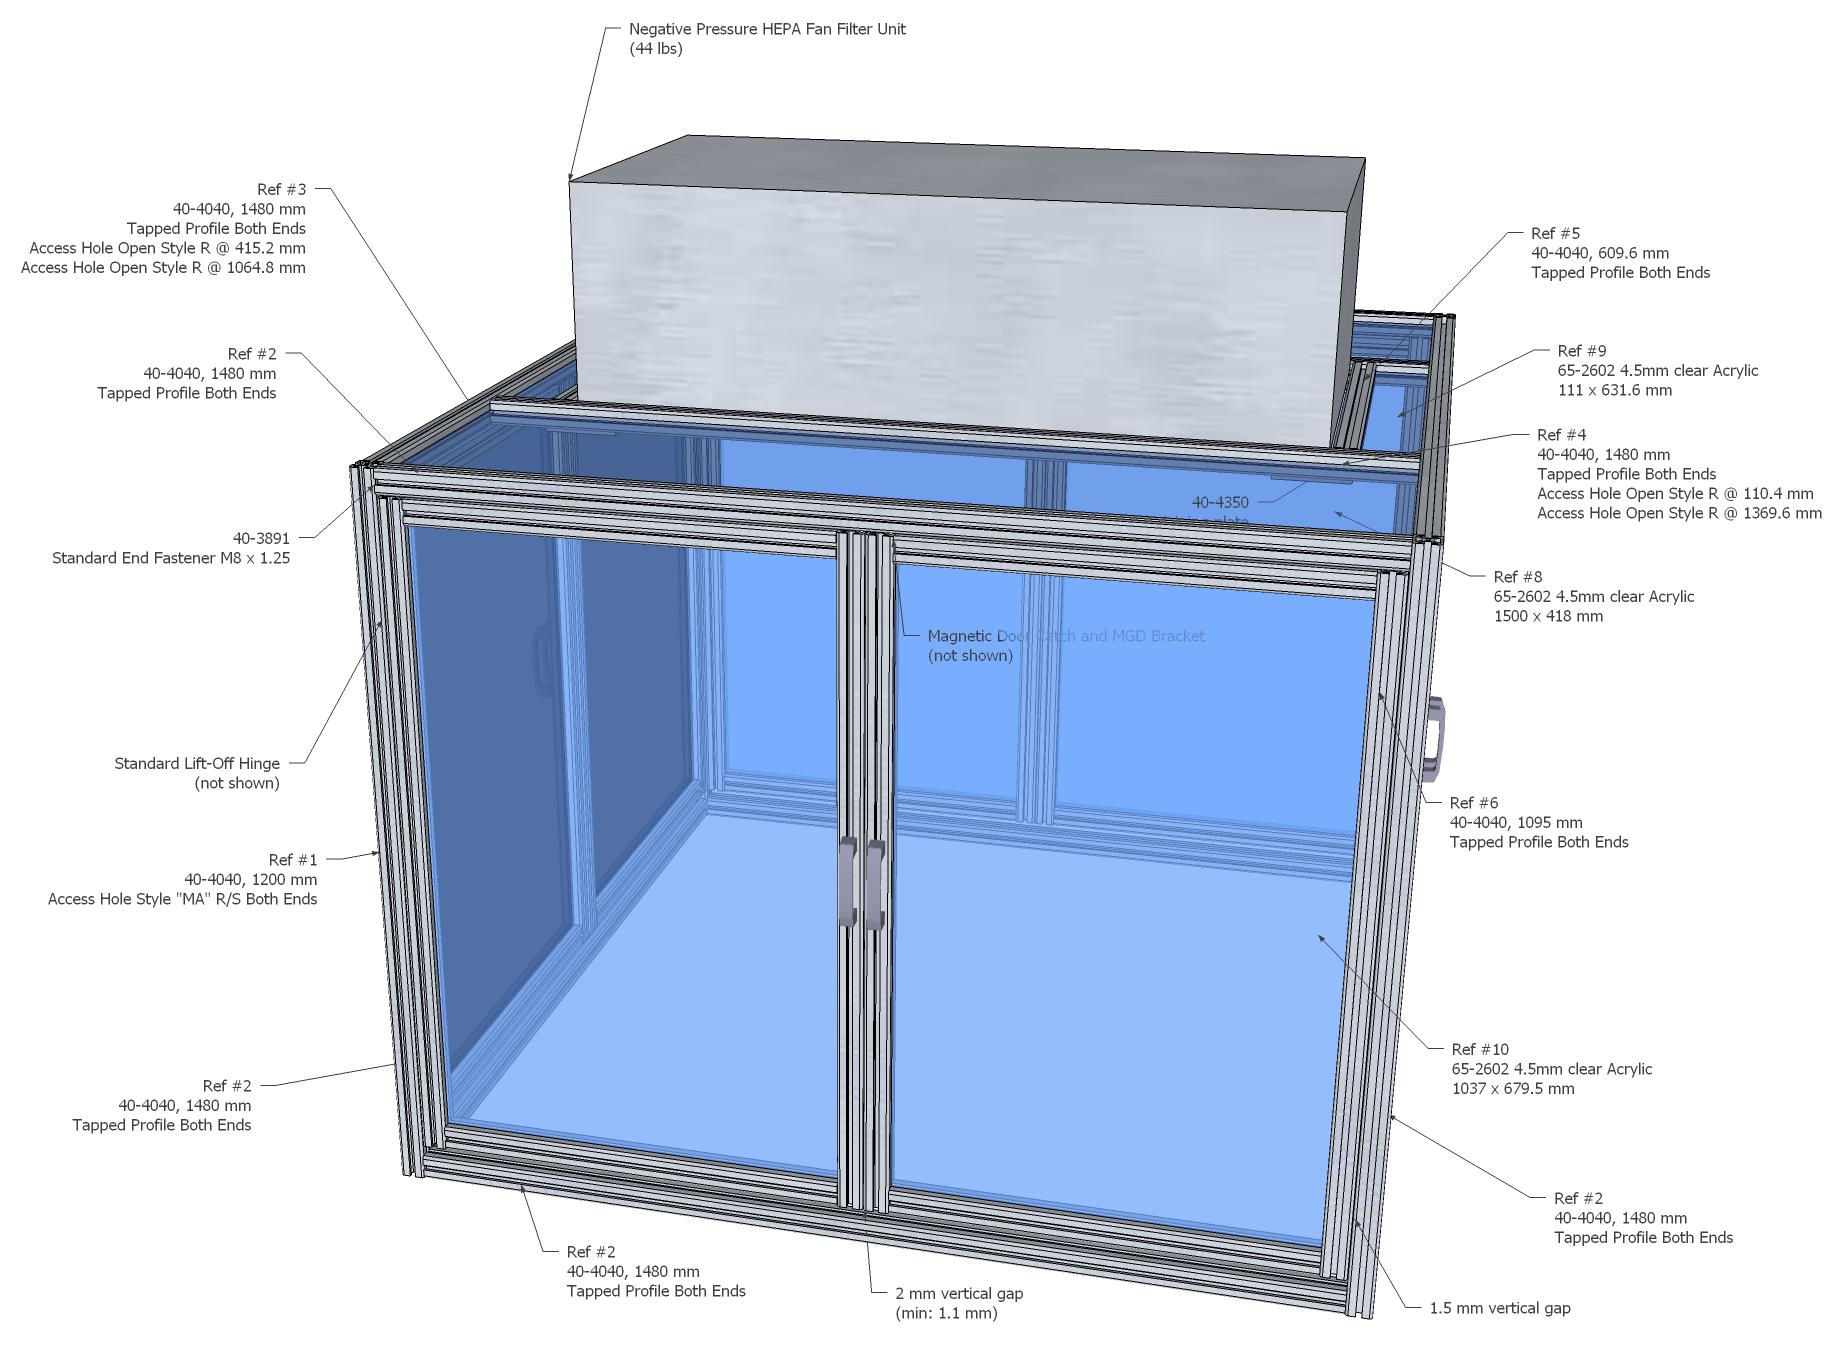 Design for negative-pressure biosafety enclosure.